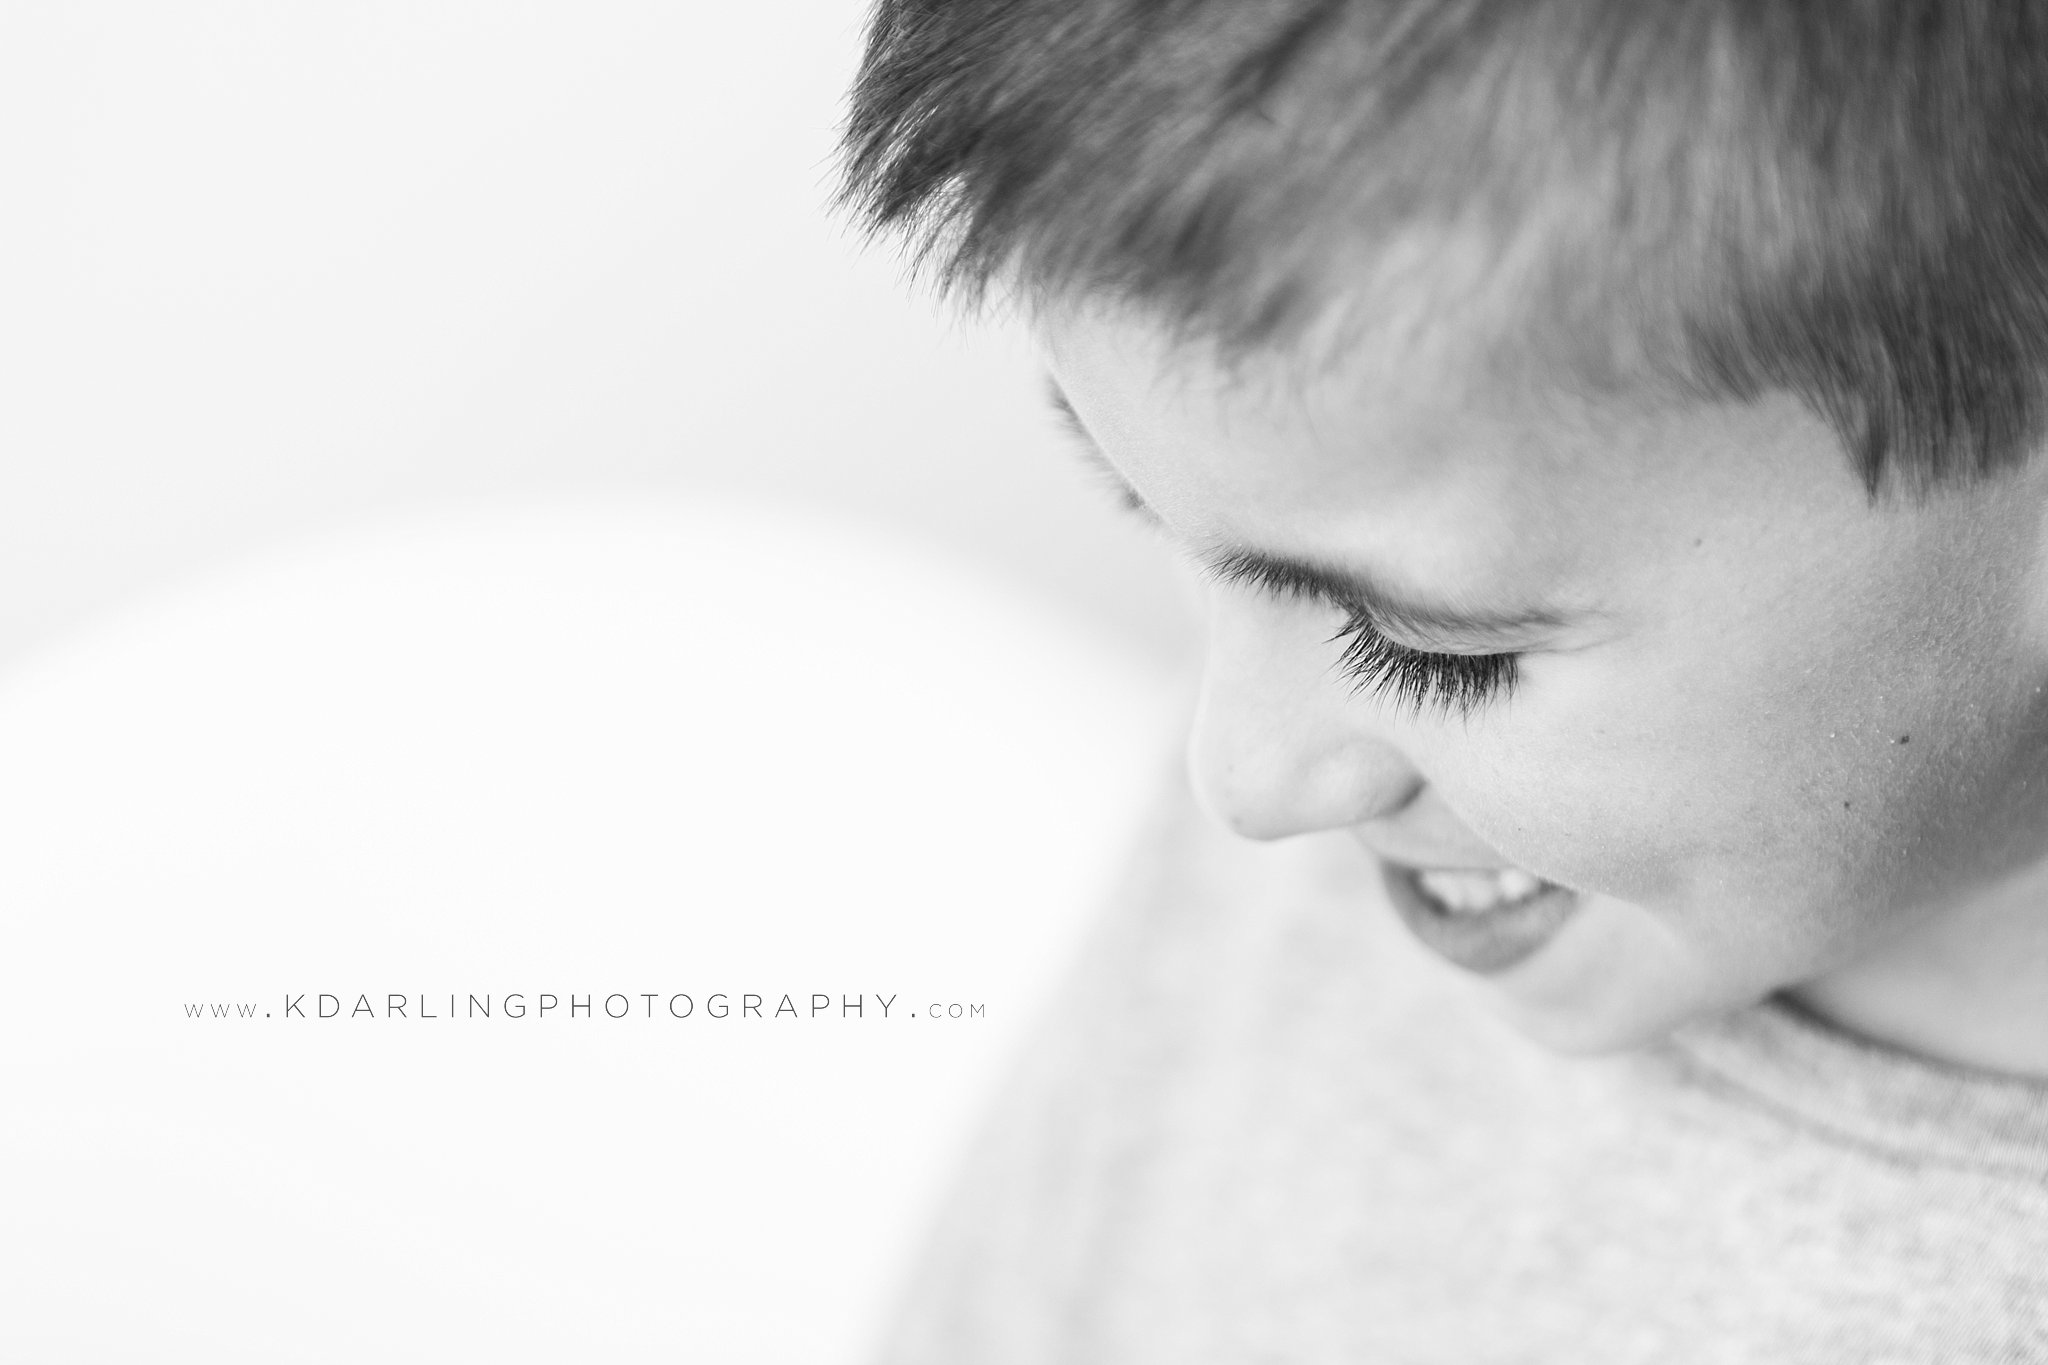 Child-Photographer-portraits-Champaign-County-IL-Fisher-Studio-Darling_0177.jpg